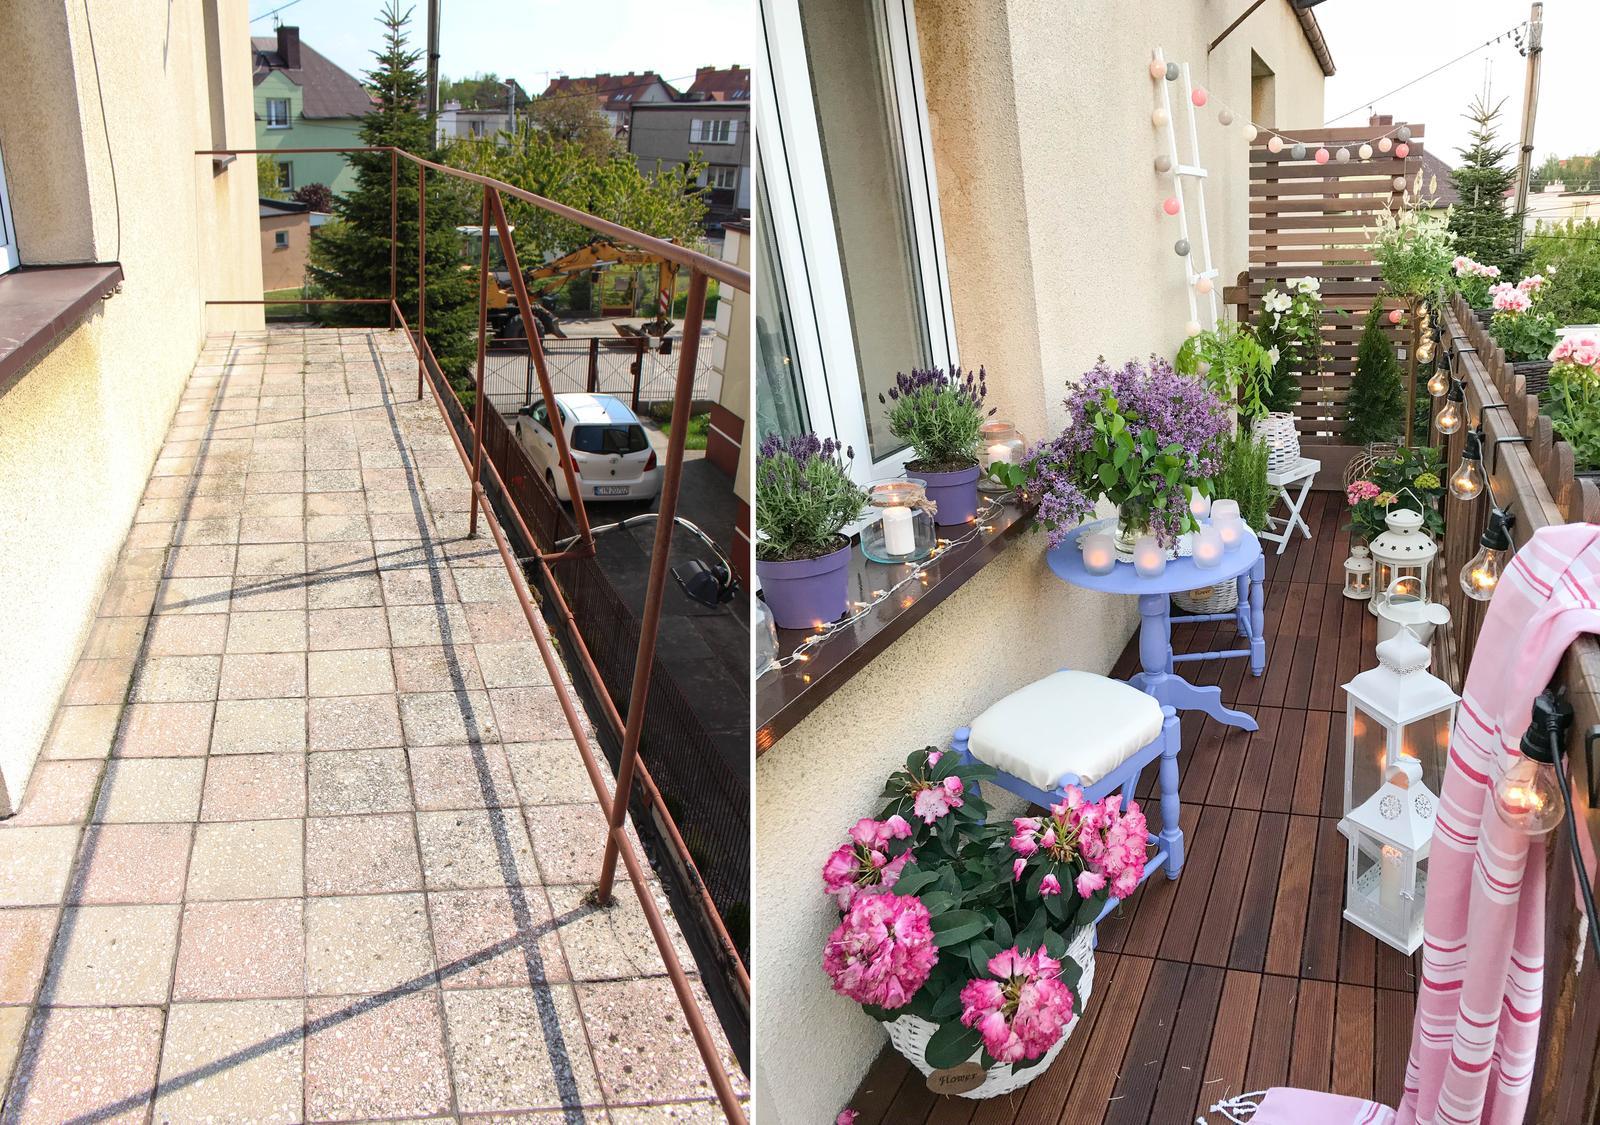 Metamorfoza balkona drevenou terasou - Obrázok č. 1